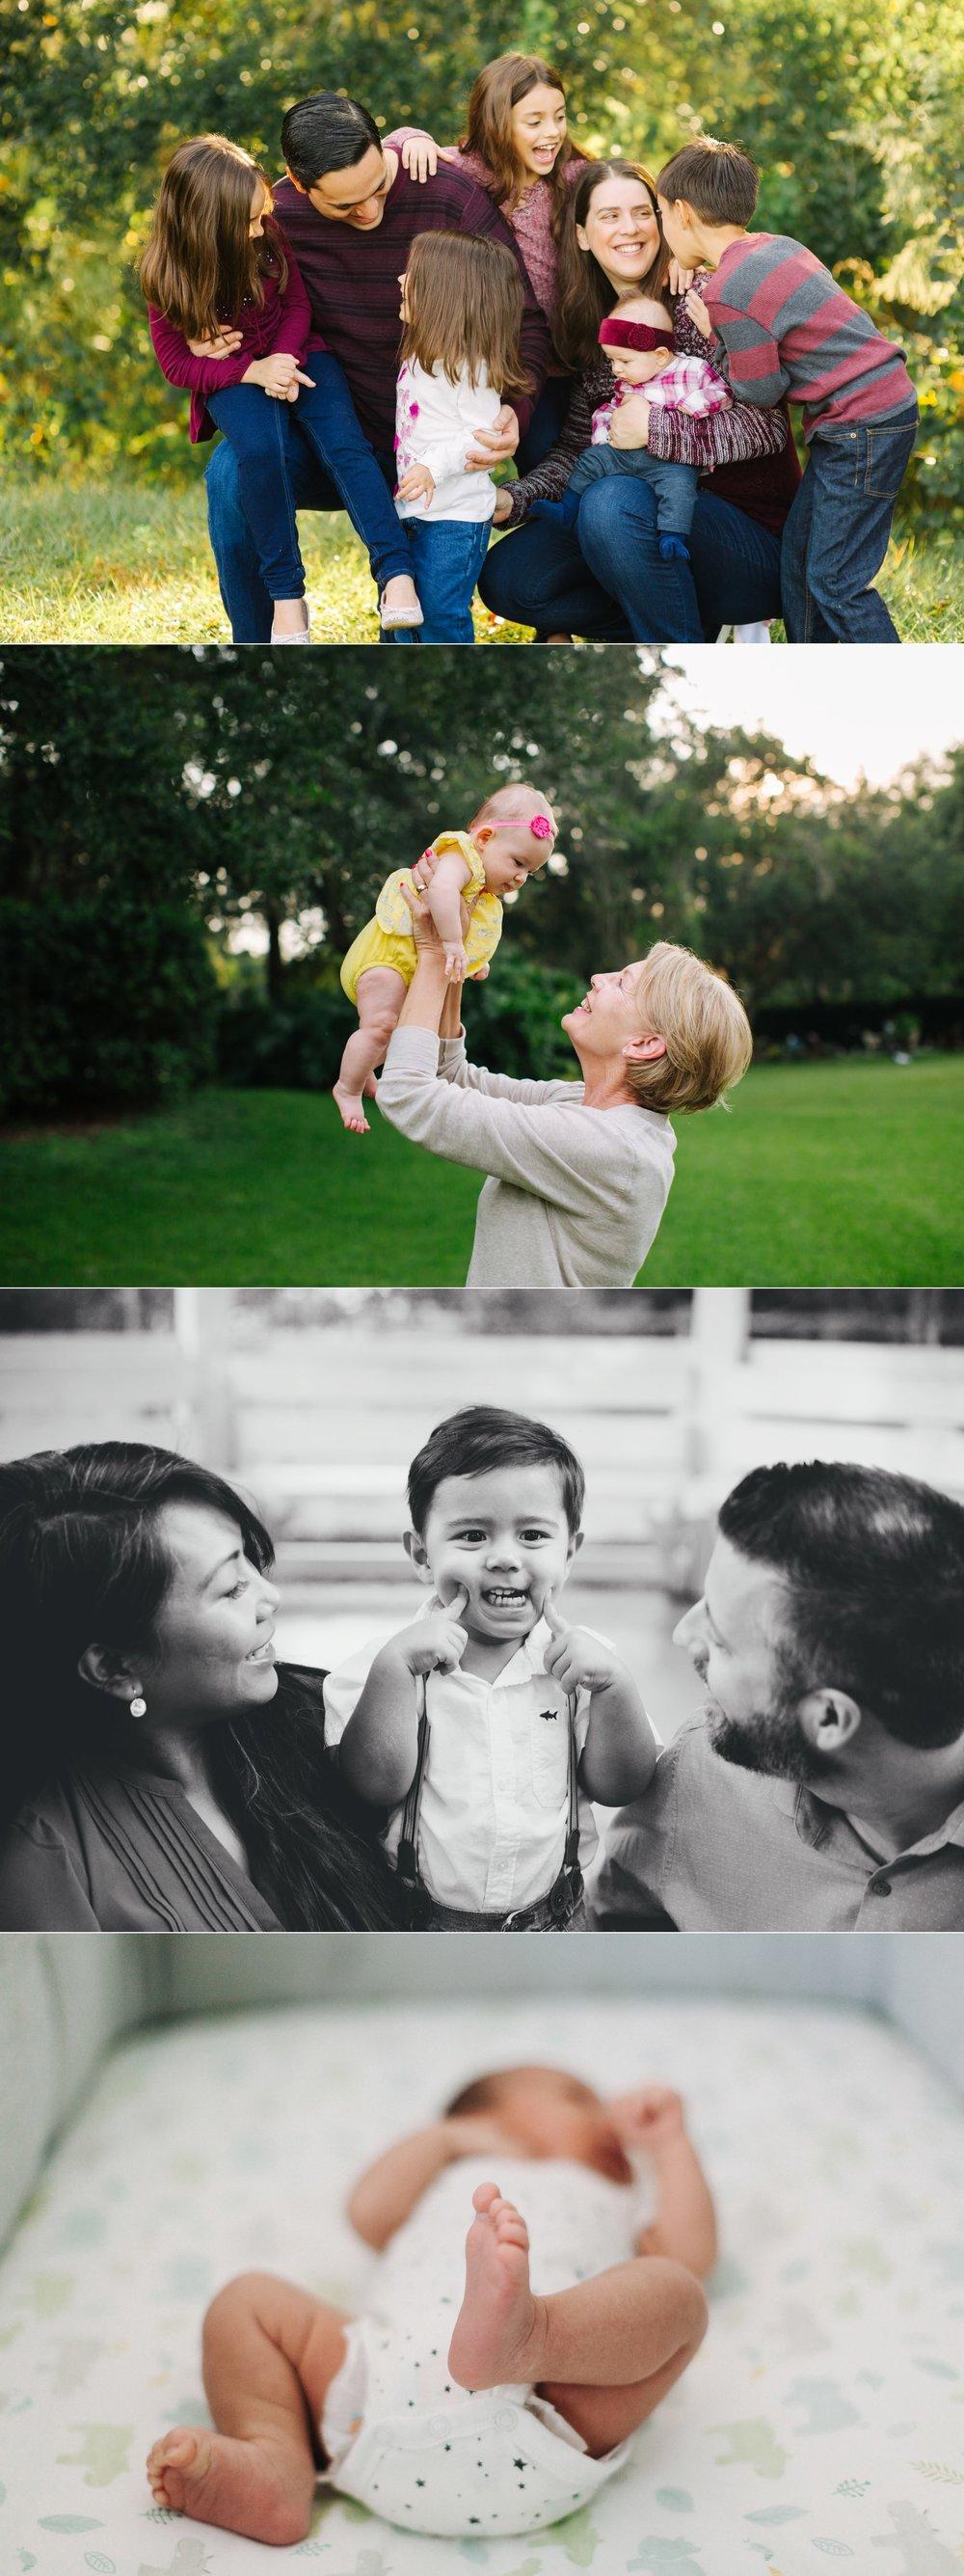 Jake & Katie's Best of Families 2016-018.jpg